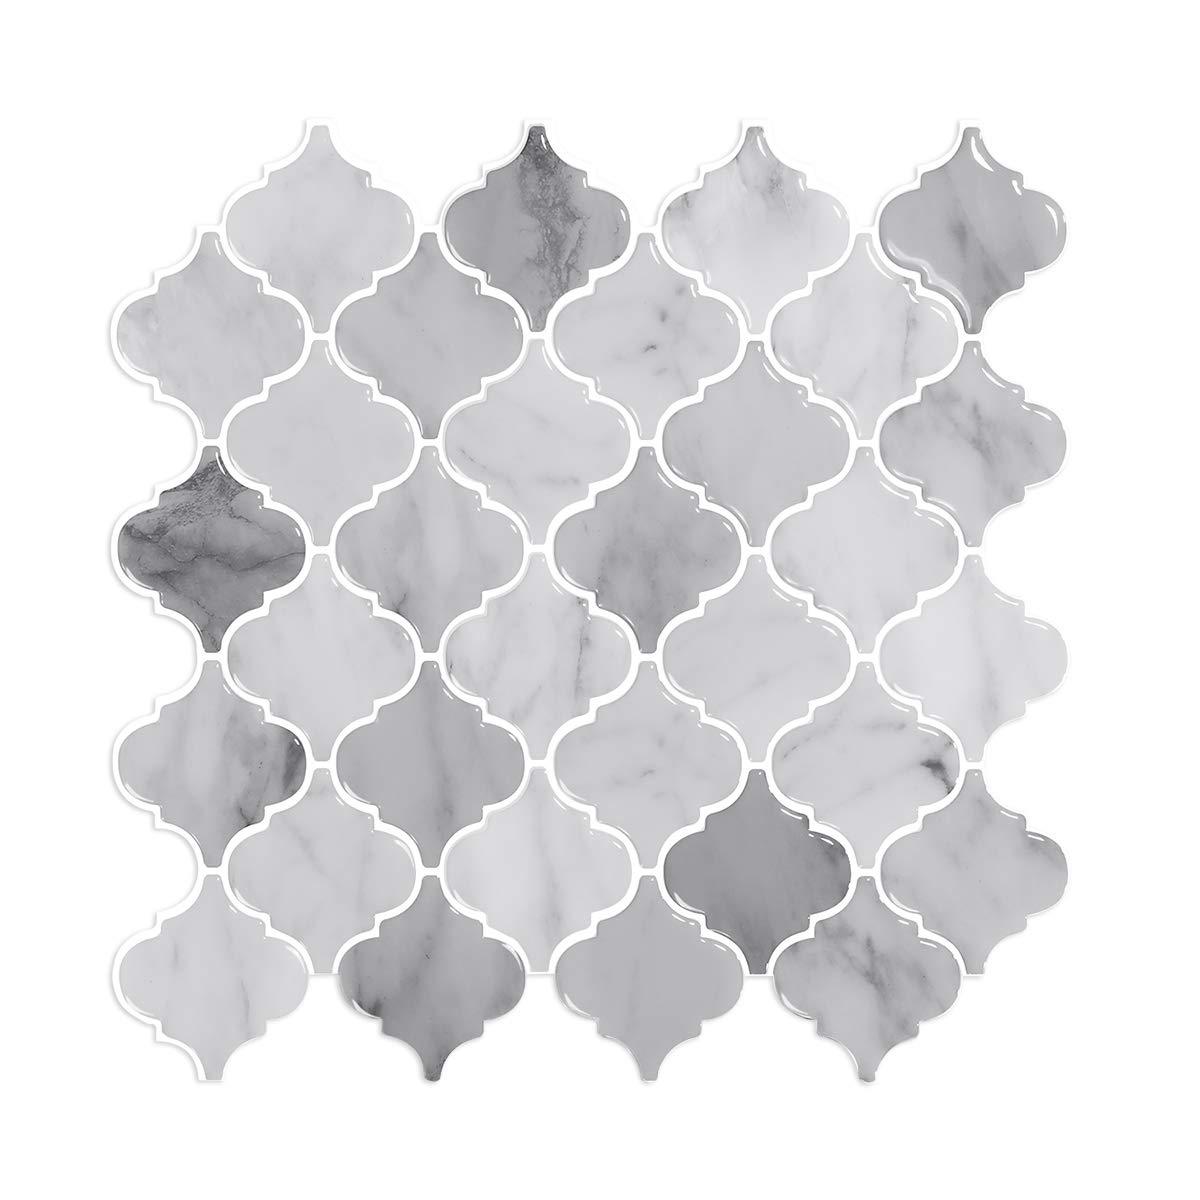 "Peel and Stick Wall Tile for Kitchen, 12"" X 12"" Arabesque Tile Peel and Stick Backsplash Decorative Tiles, Stick on Backsplash (5 Sheets, Thicker Design)"